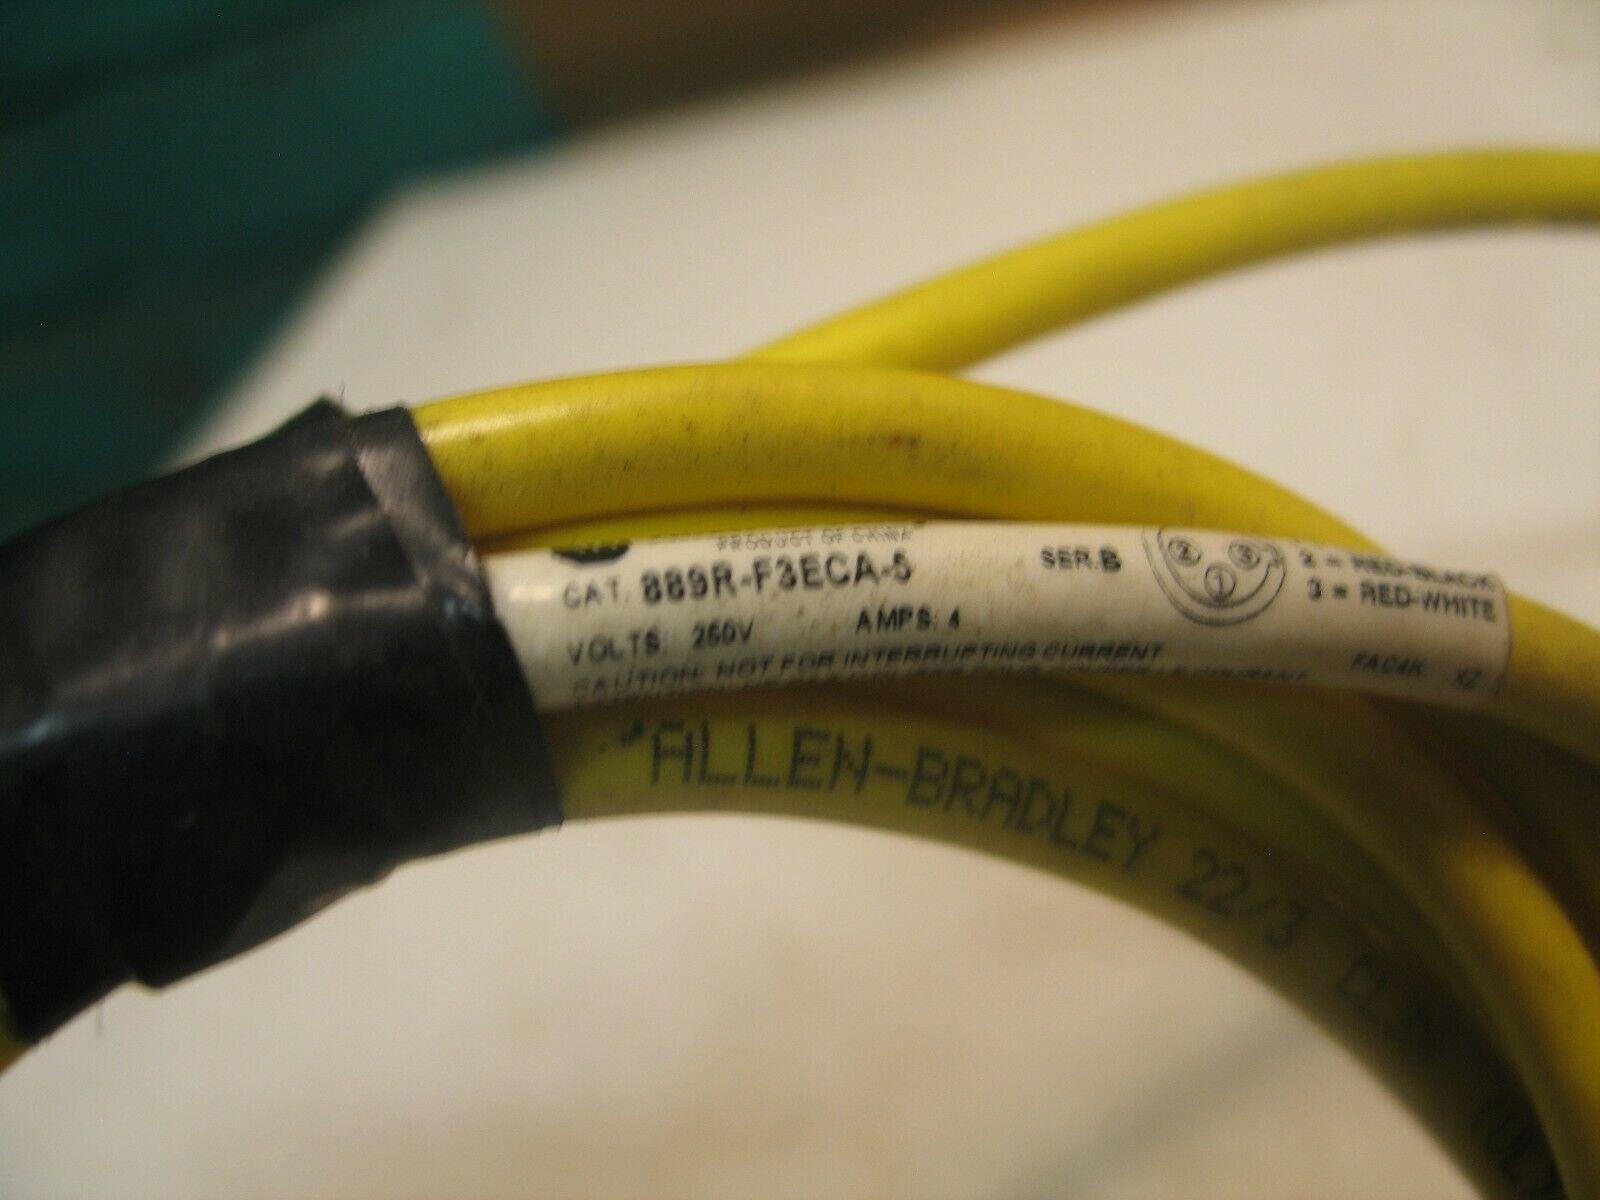 10 PC. WIELAND 8213B//5F 5//C FEMALE CONNECTOR BLOCK